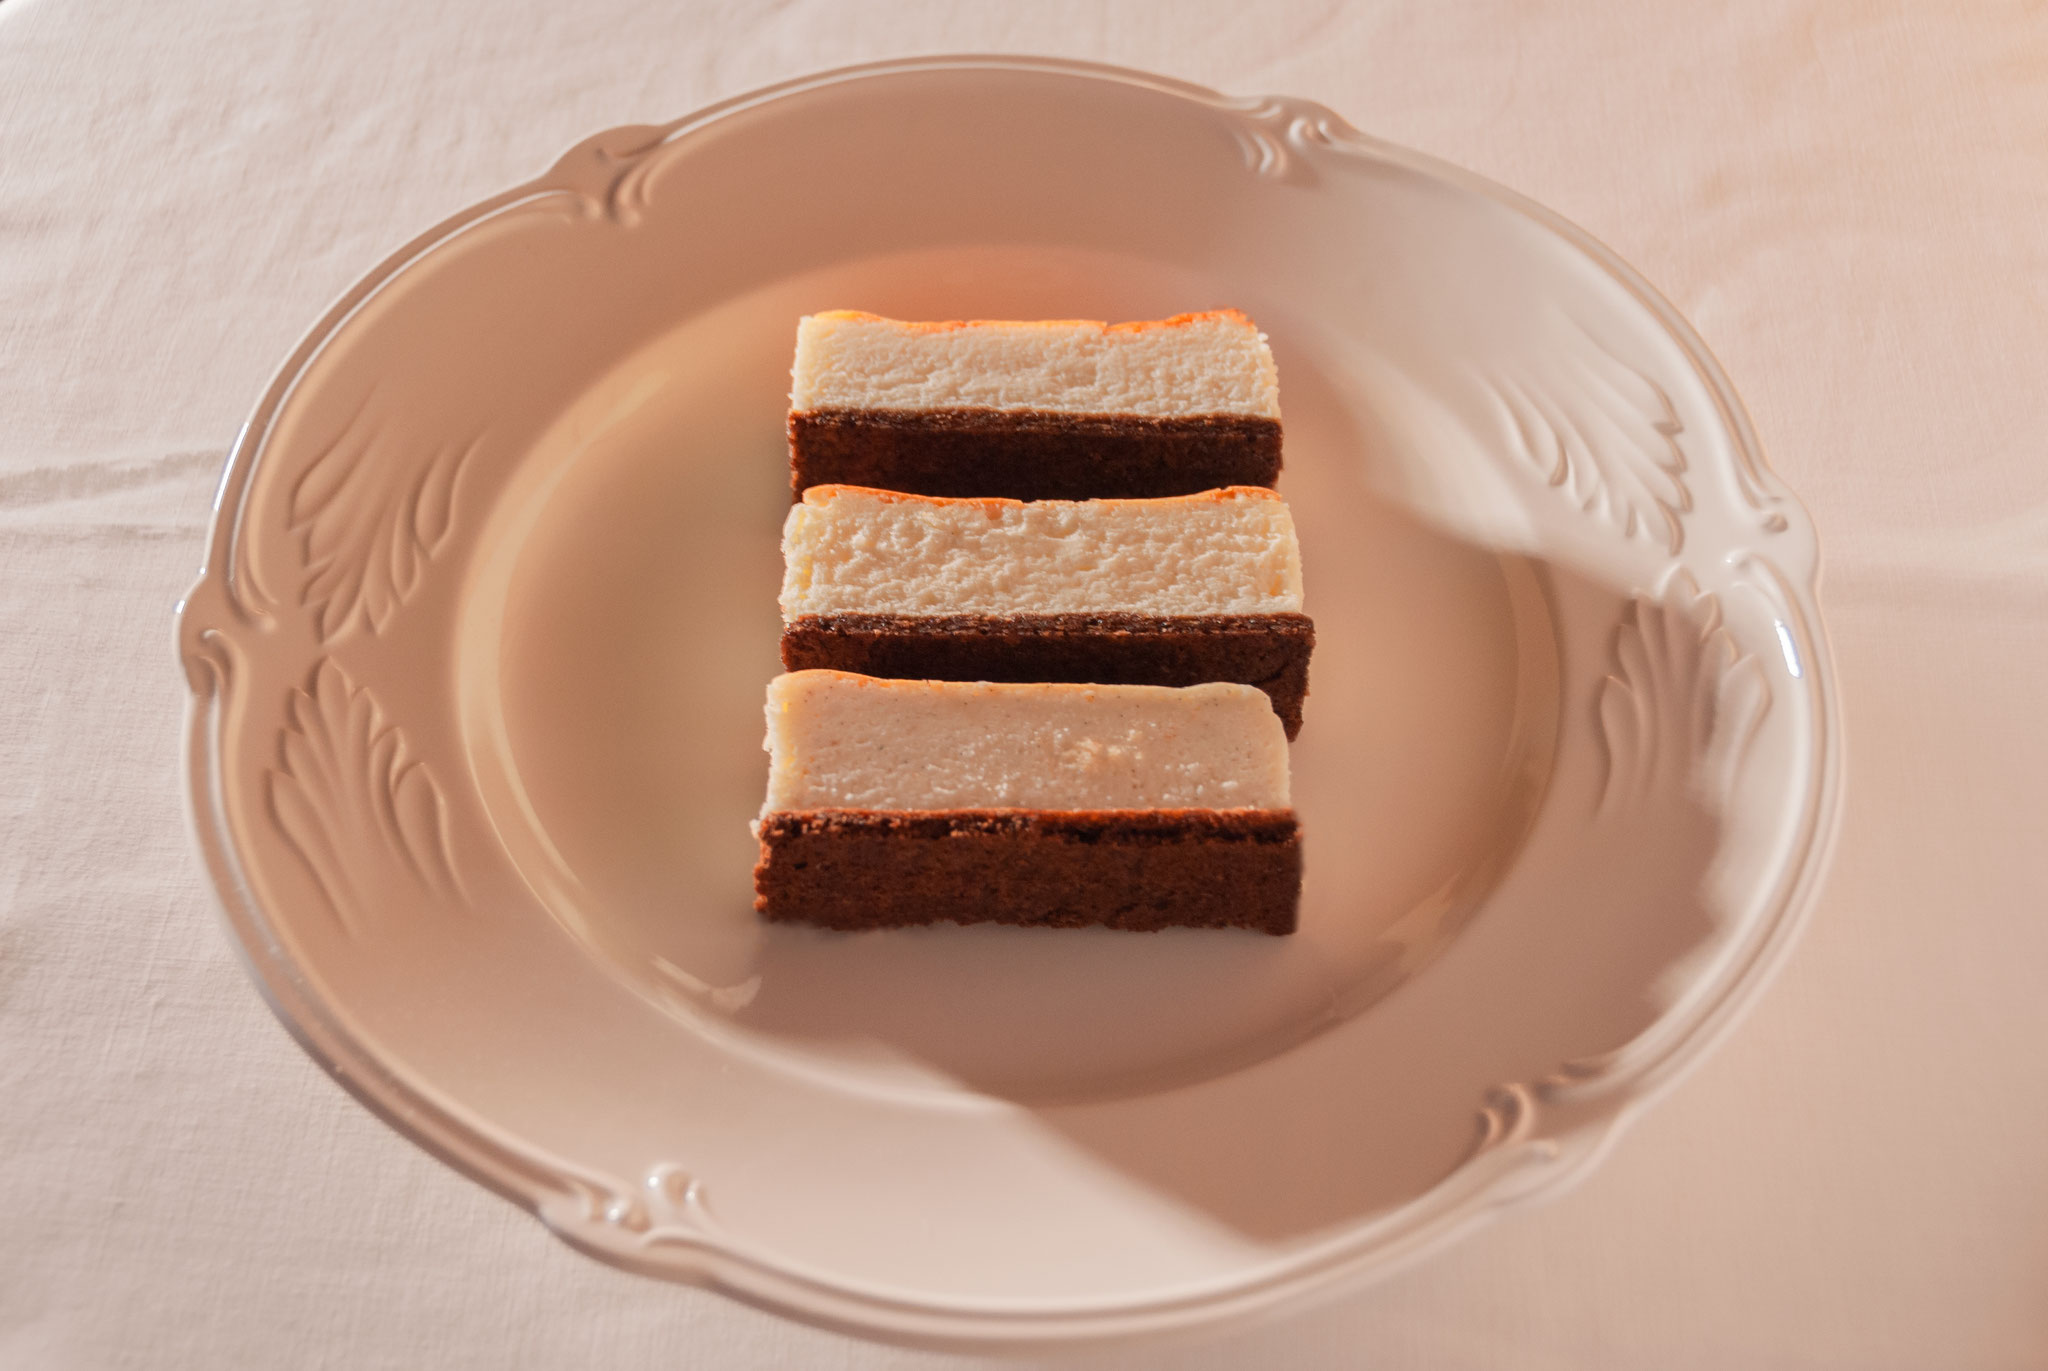 3 New York-Style Cheesecakes, Fleur*Fleur*